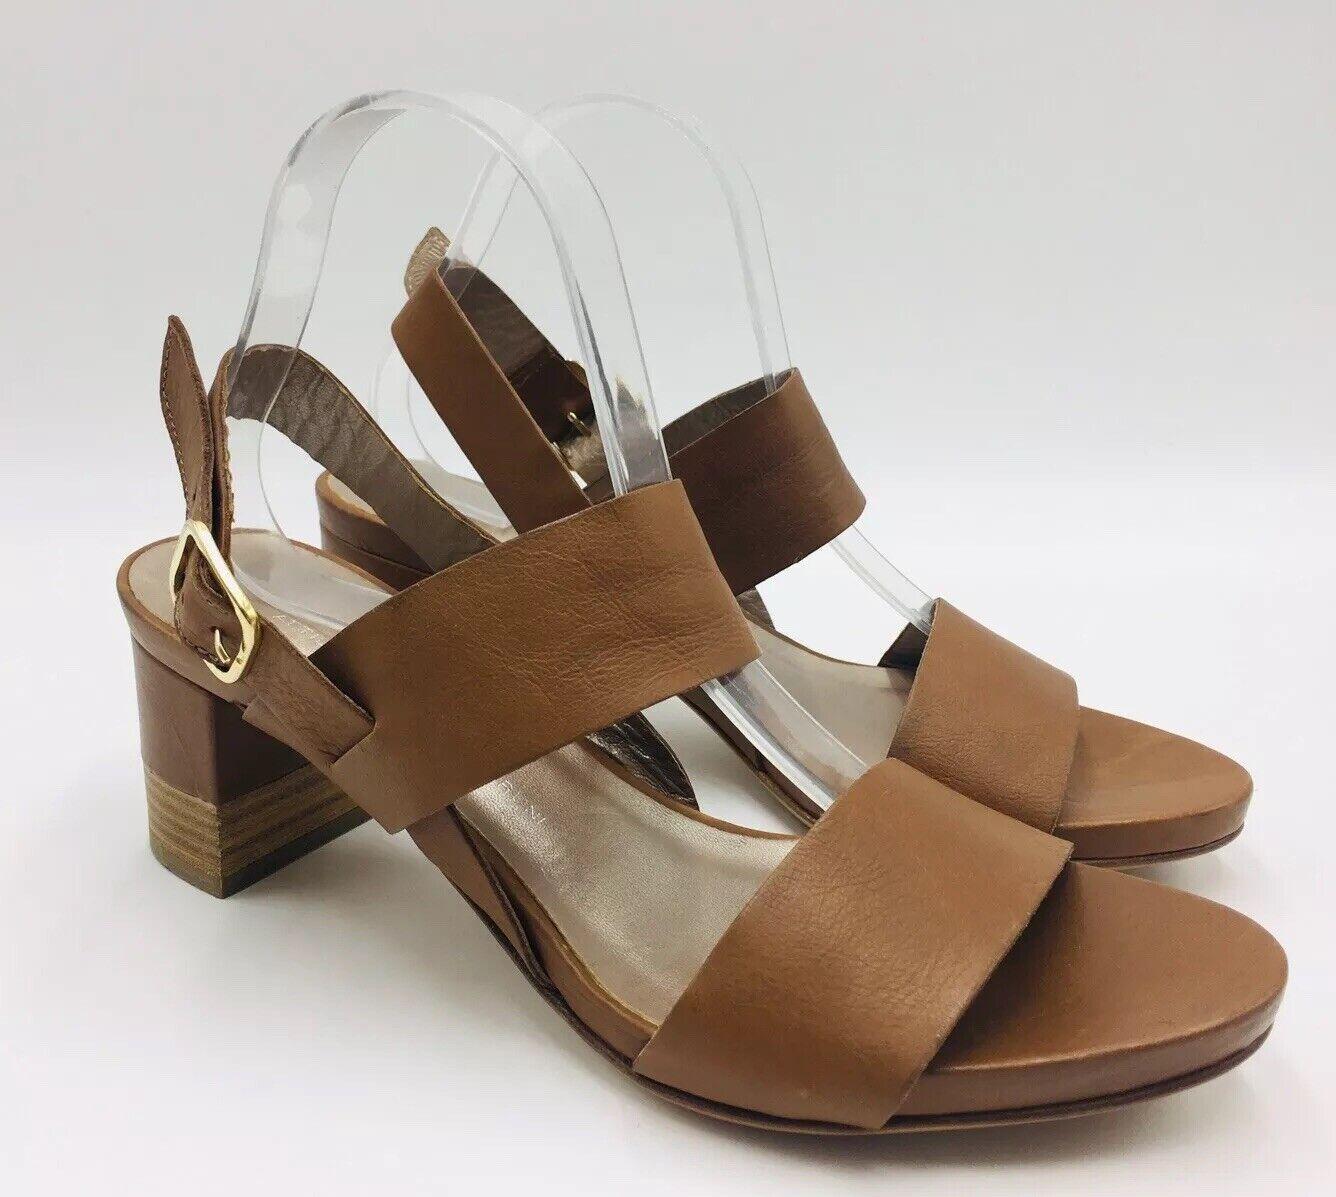 ATTILIO GIUSTI LEOMBRUNI Stacked Block Heel Sandal Size 42 Brown, MSRP  425